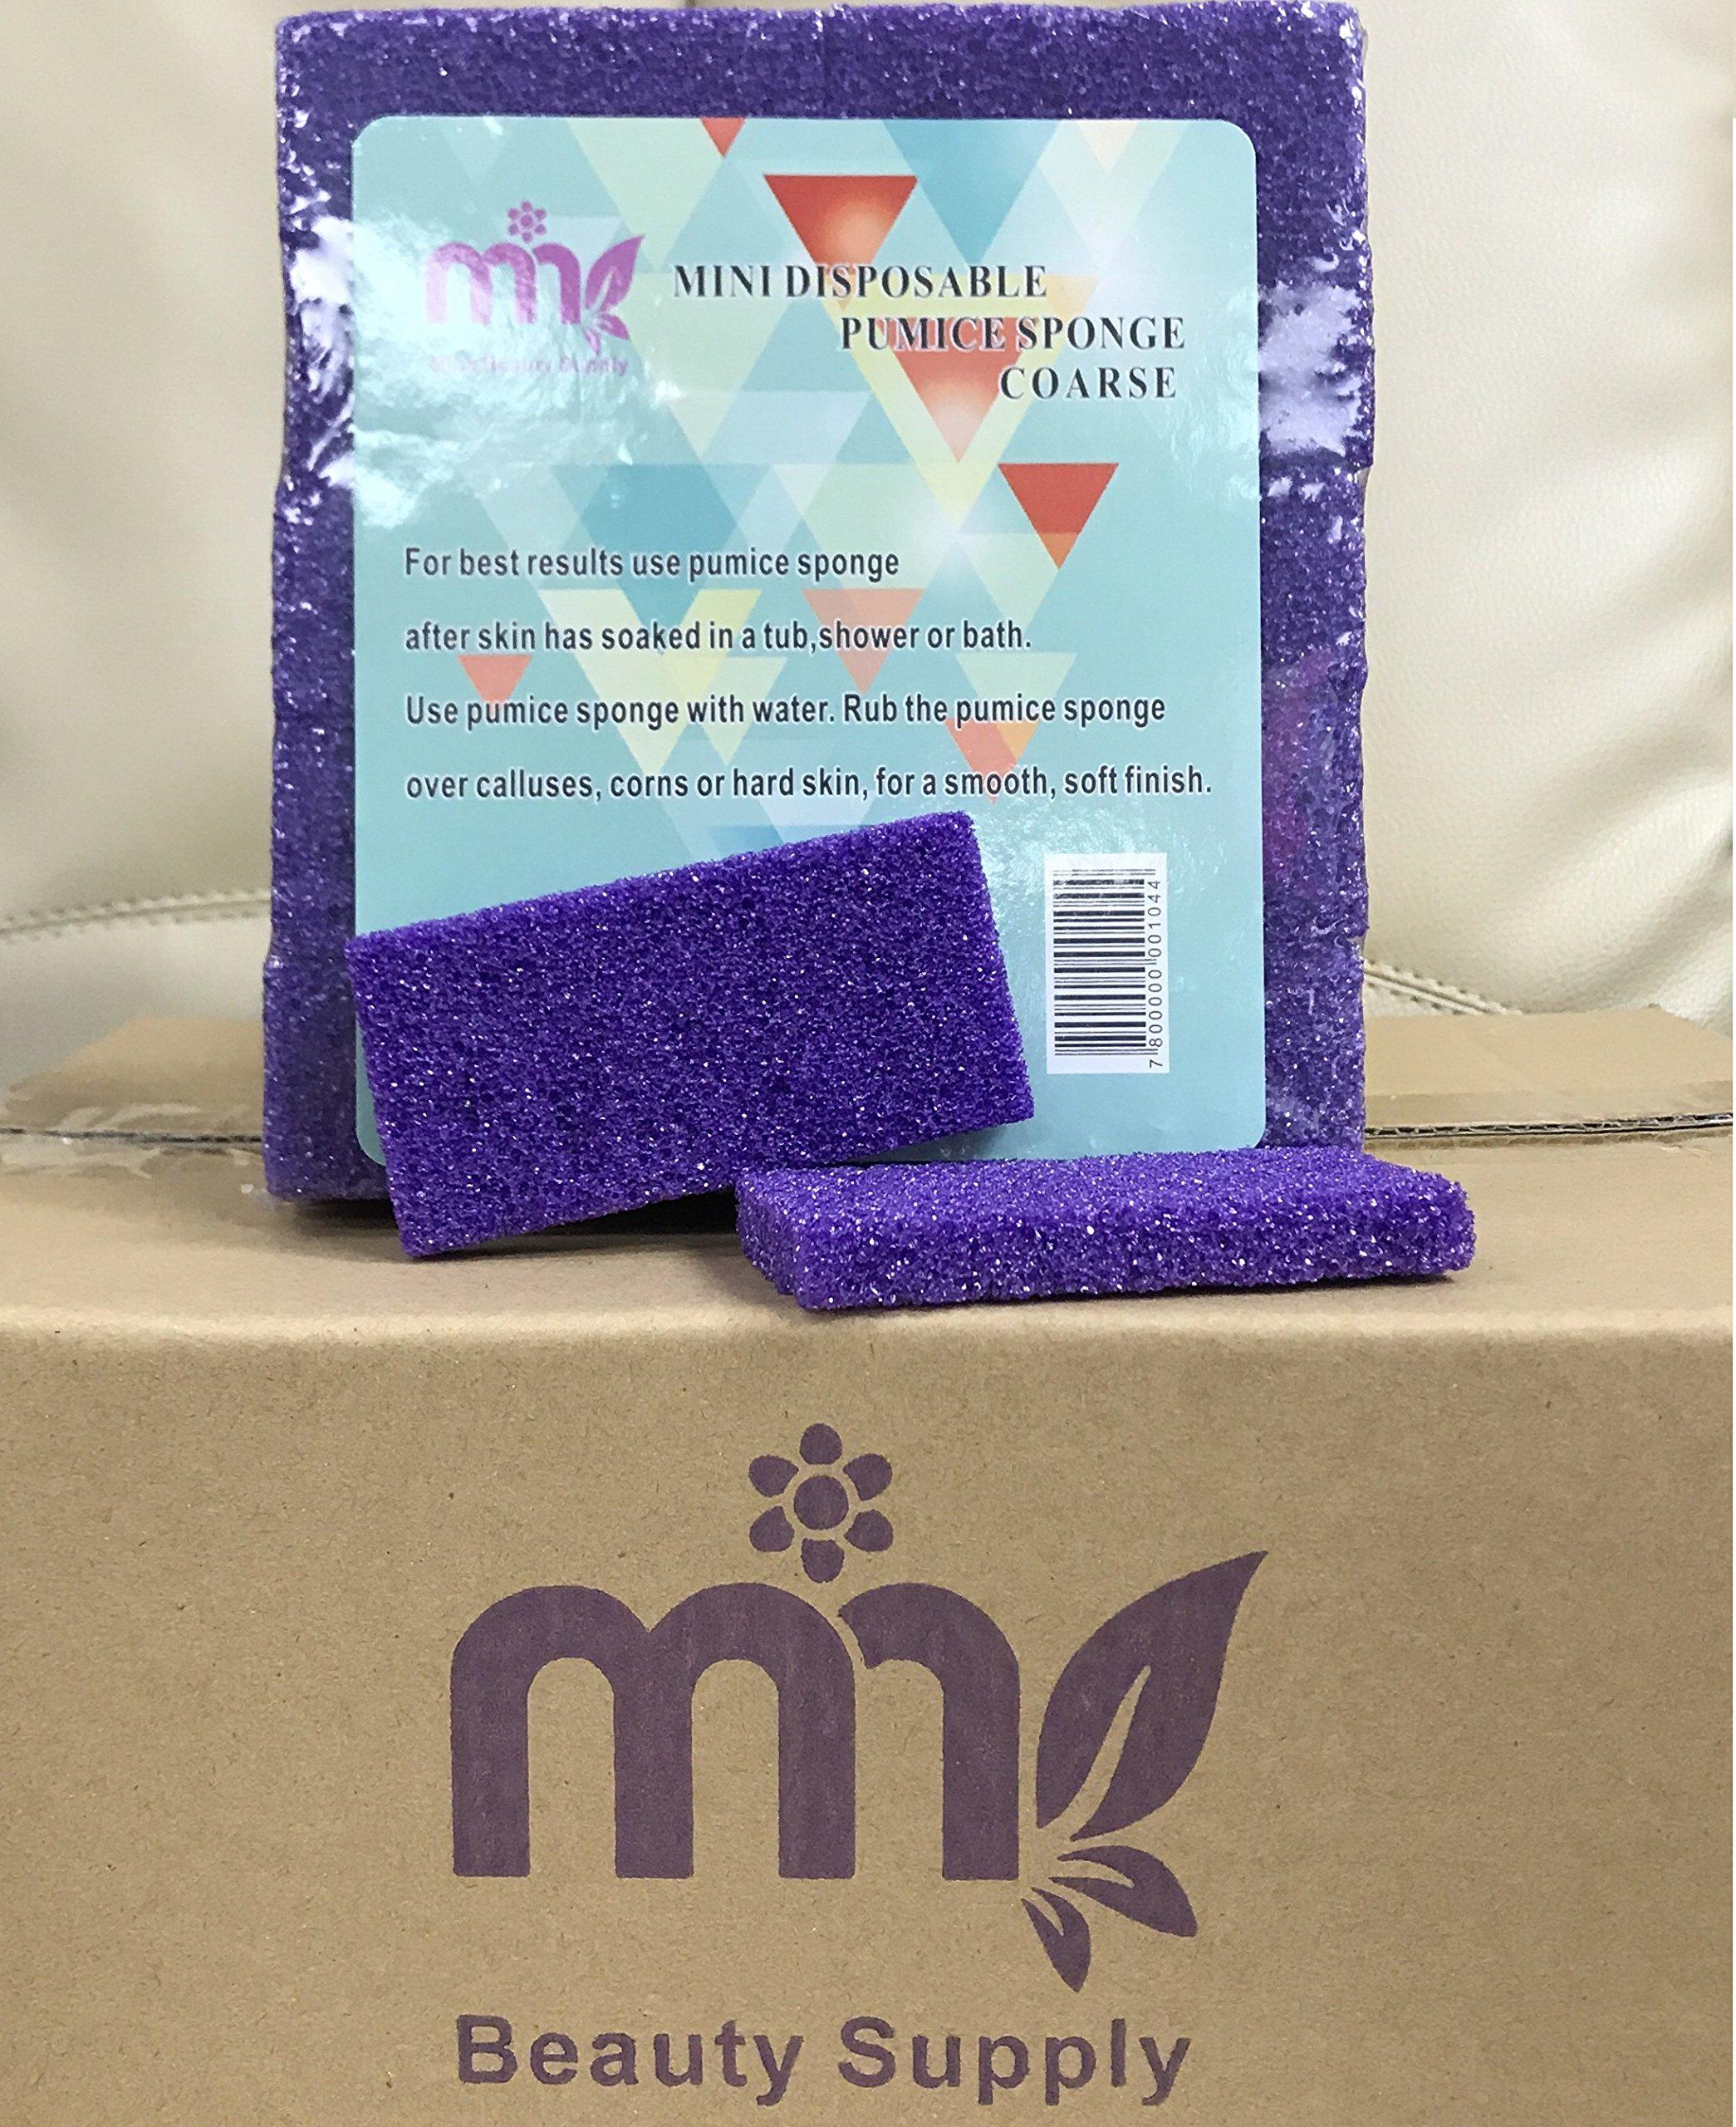 Nail Mini Pumice Disposable Buffing Pad for Feet 1600 pcs - Purple (1,600 pcs, Purple)